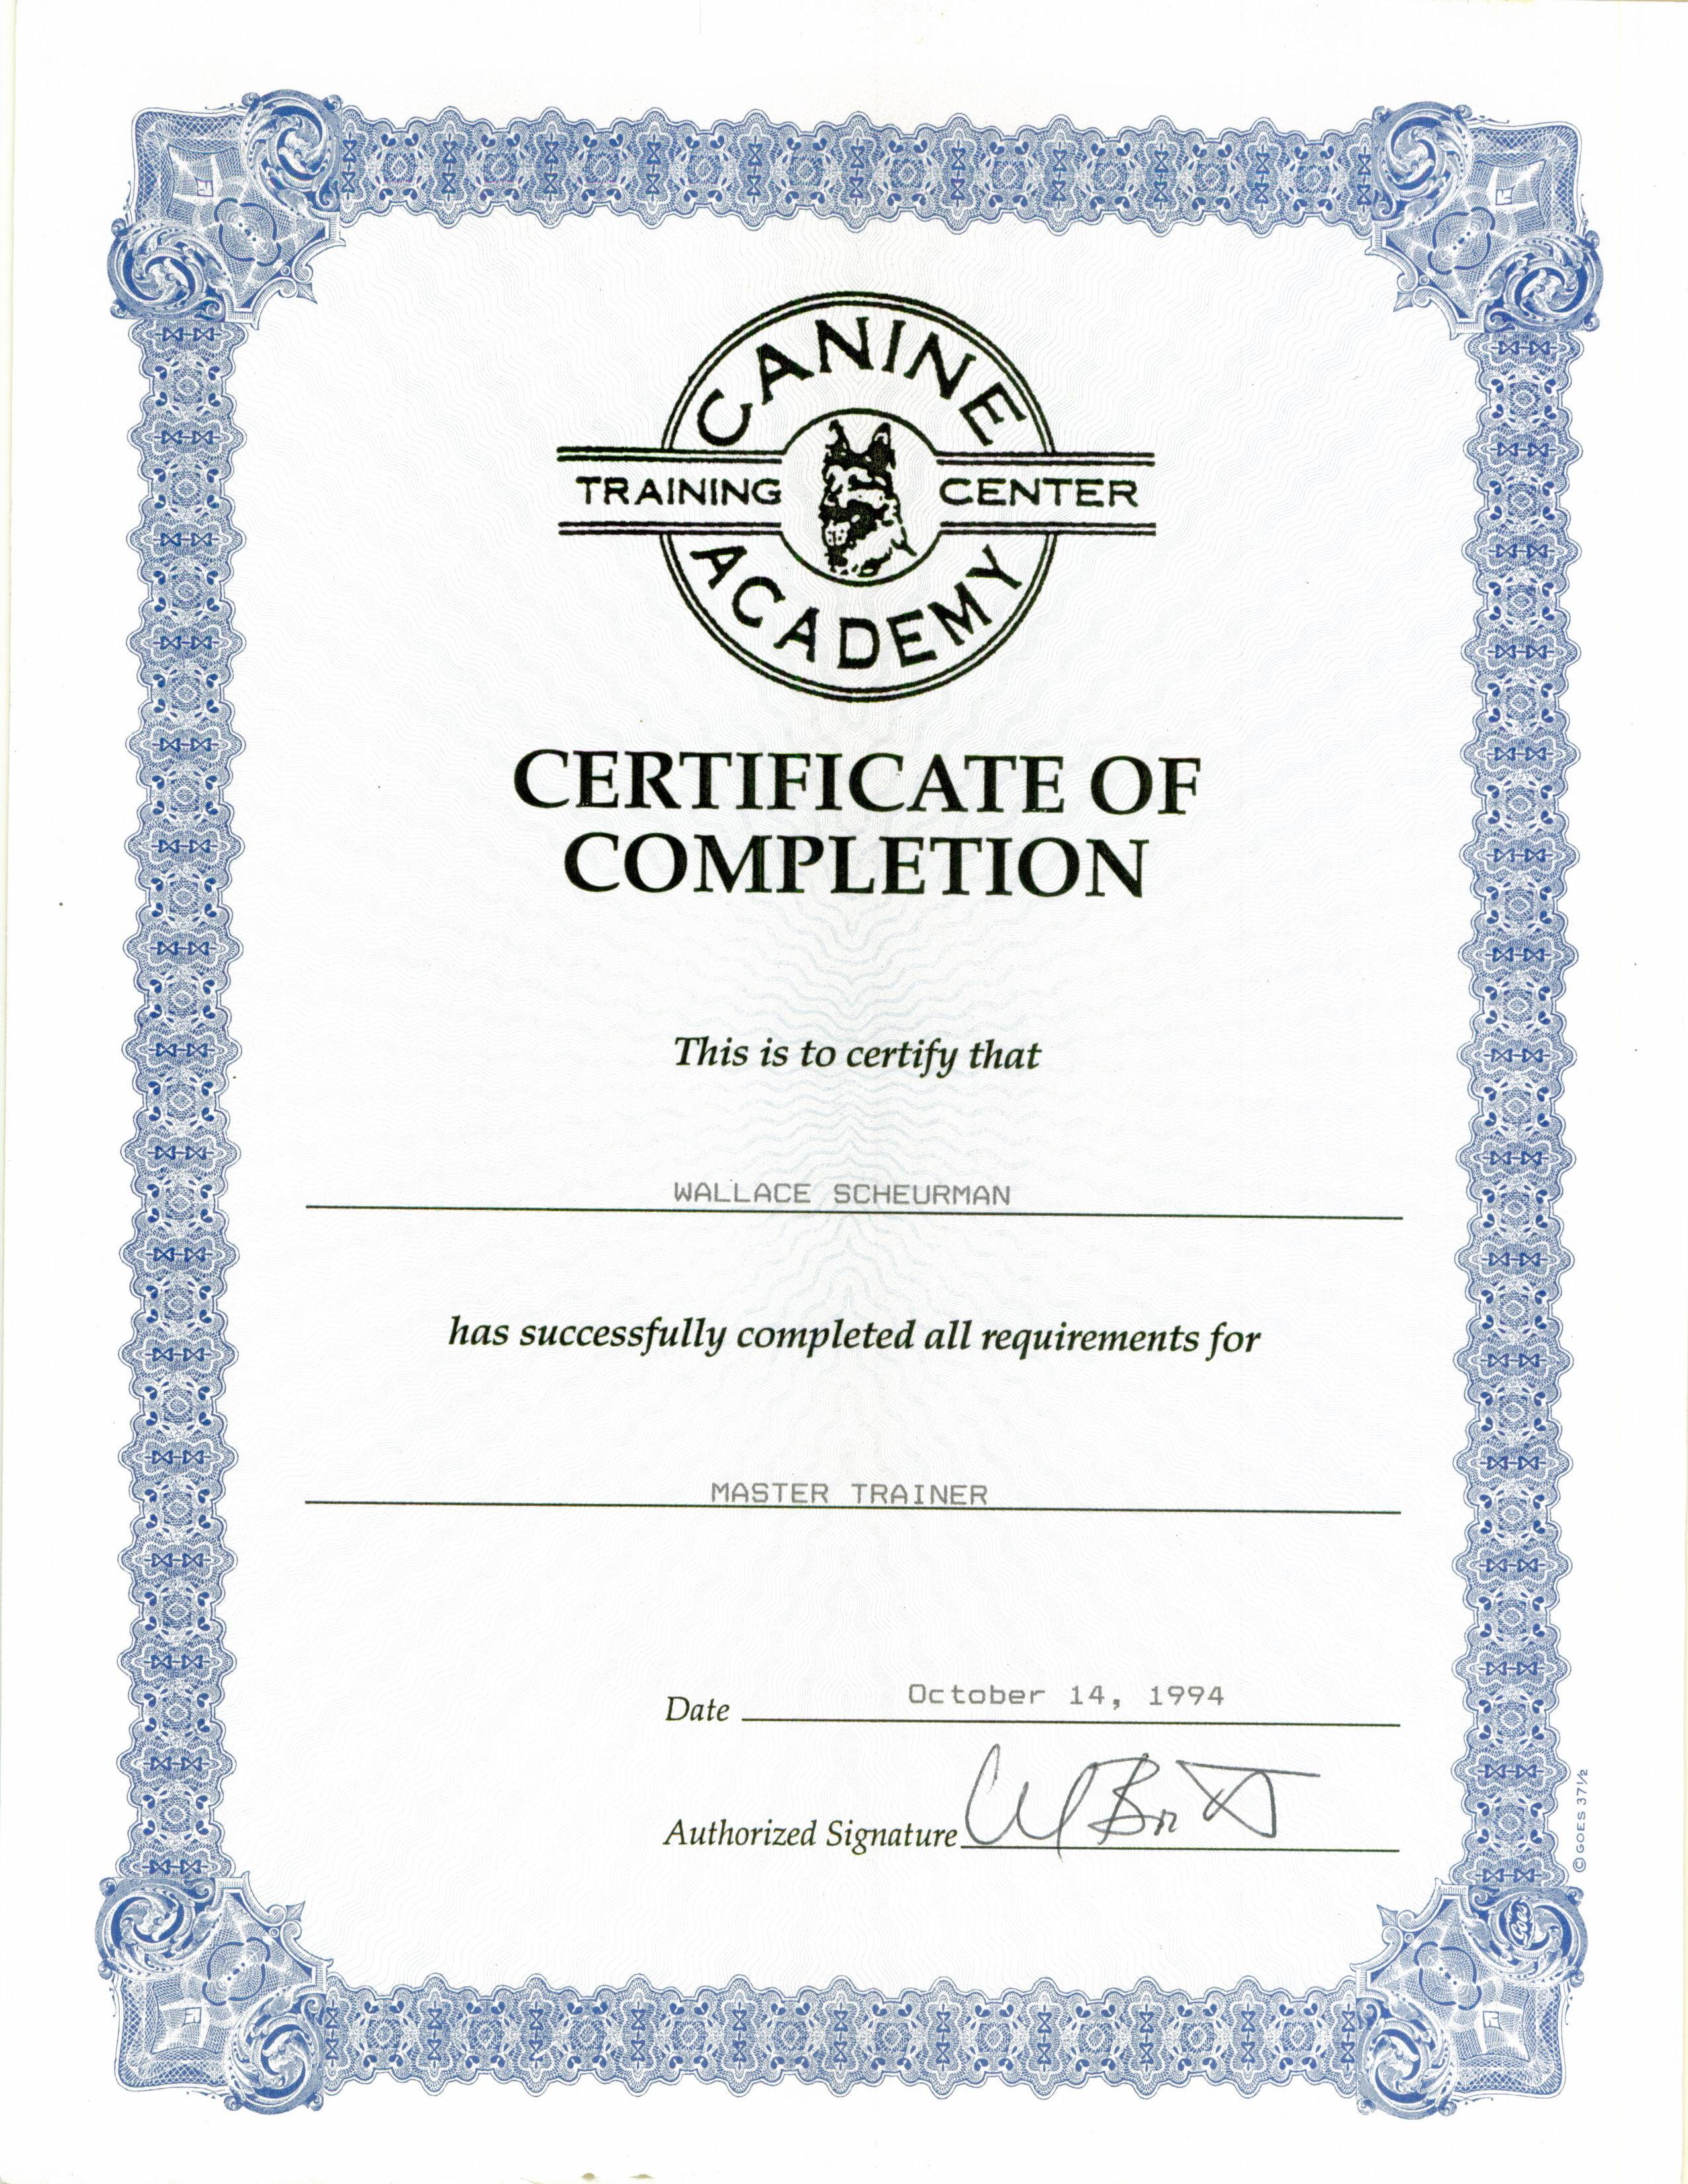 Scheurmans k9 academy dog training jacksonville florida 2016 award wallys mtc xflitez Images